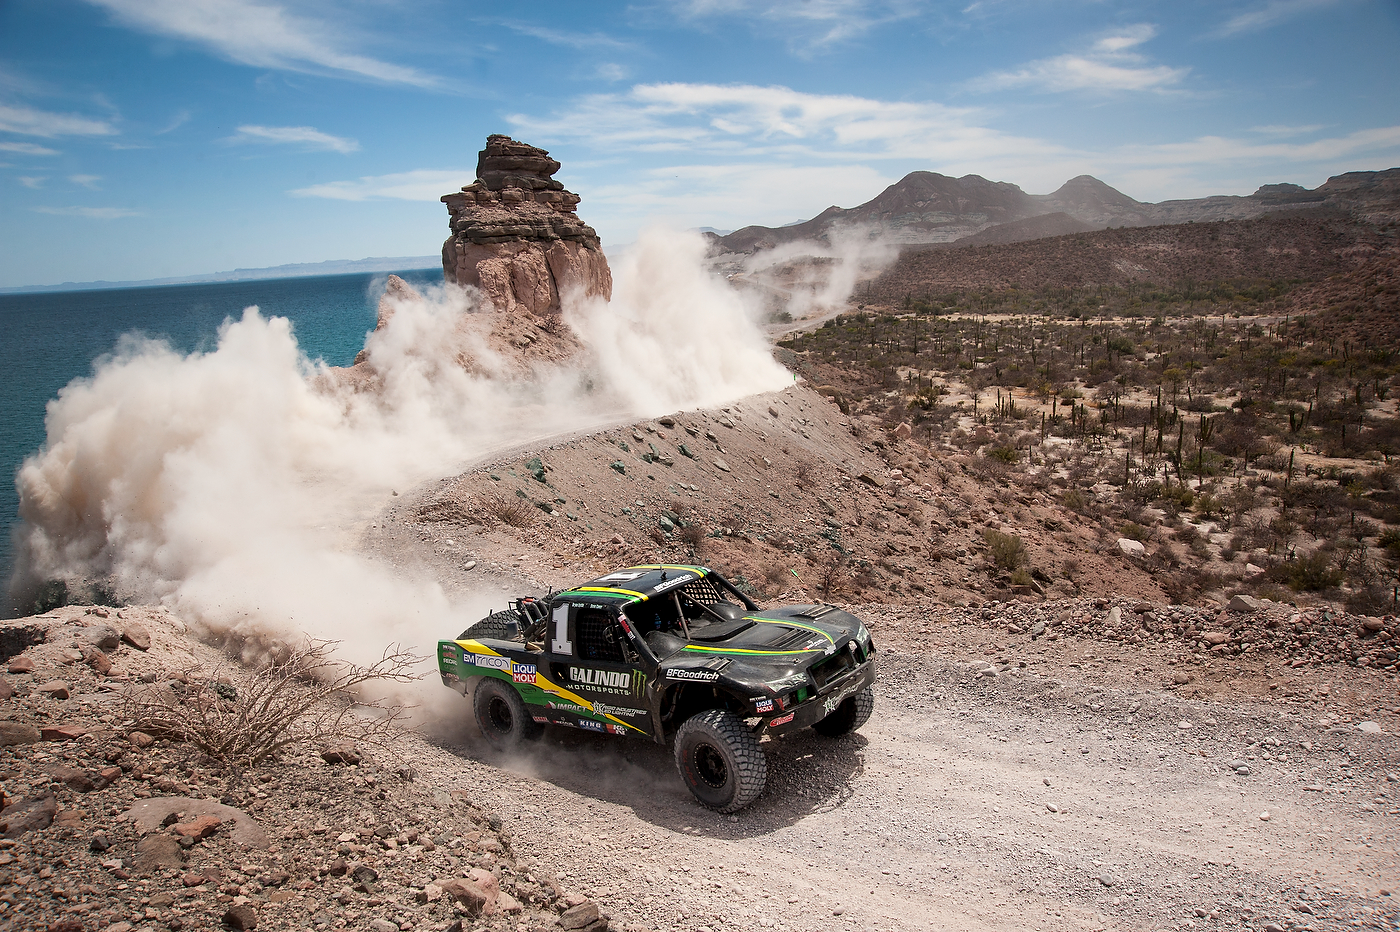 Score Baja 1000 Enselada Rallystar